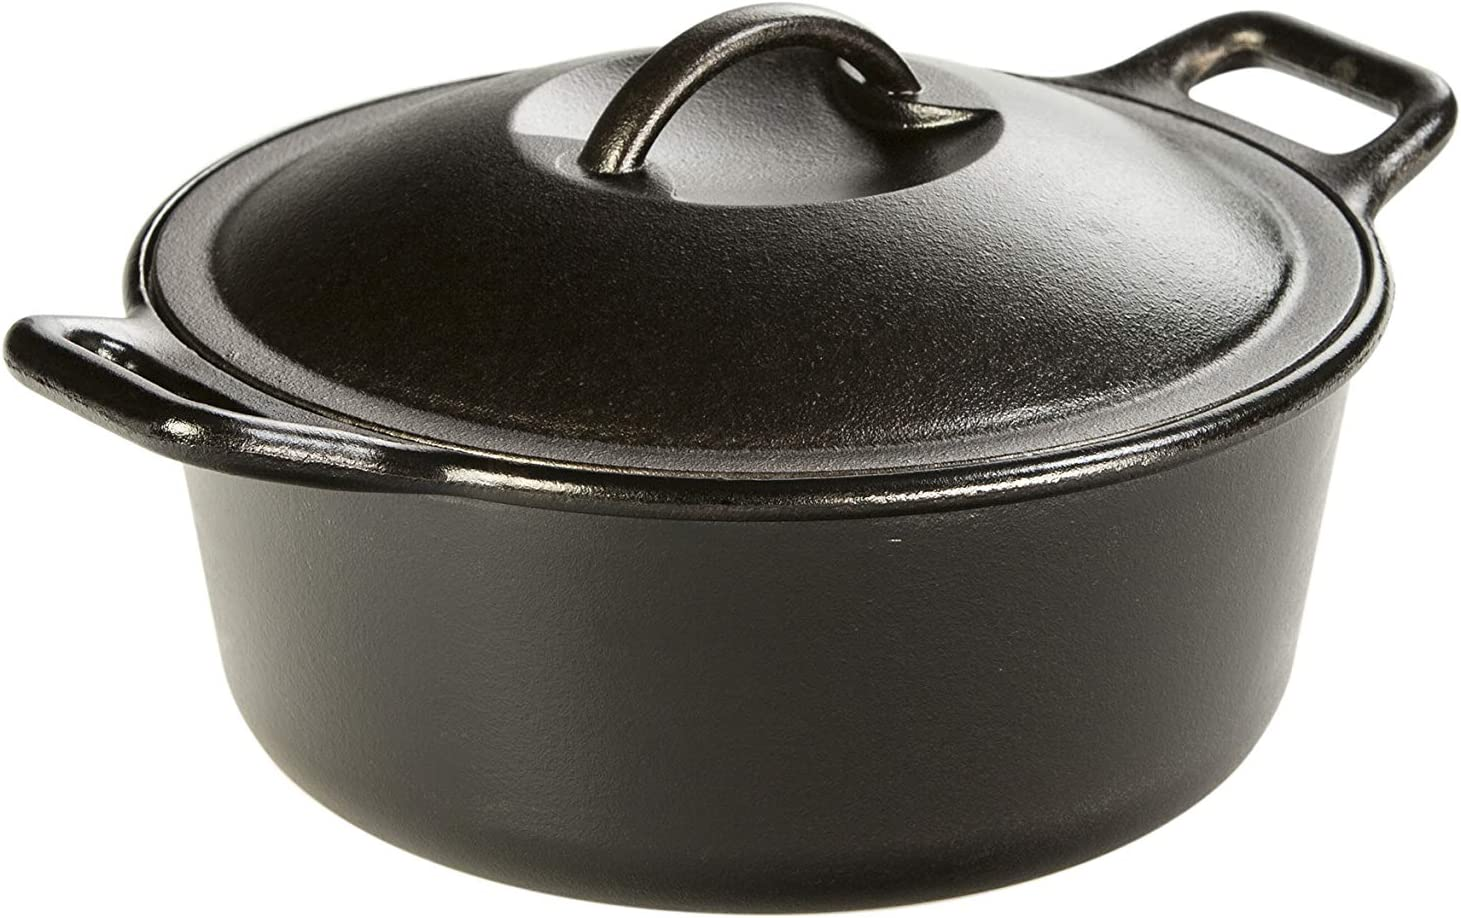 Lodge Pro-Logic 4 Dealing full price reduction Quart Cast Iron Pot w Al sold out. Pre-Seasoned Dutch Oven.